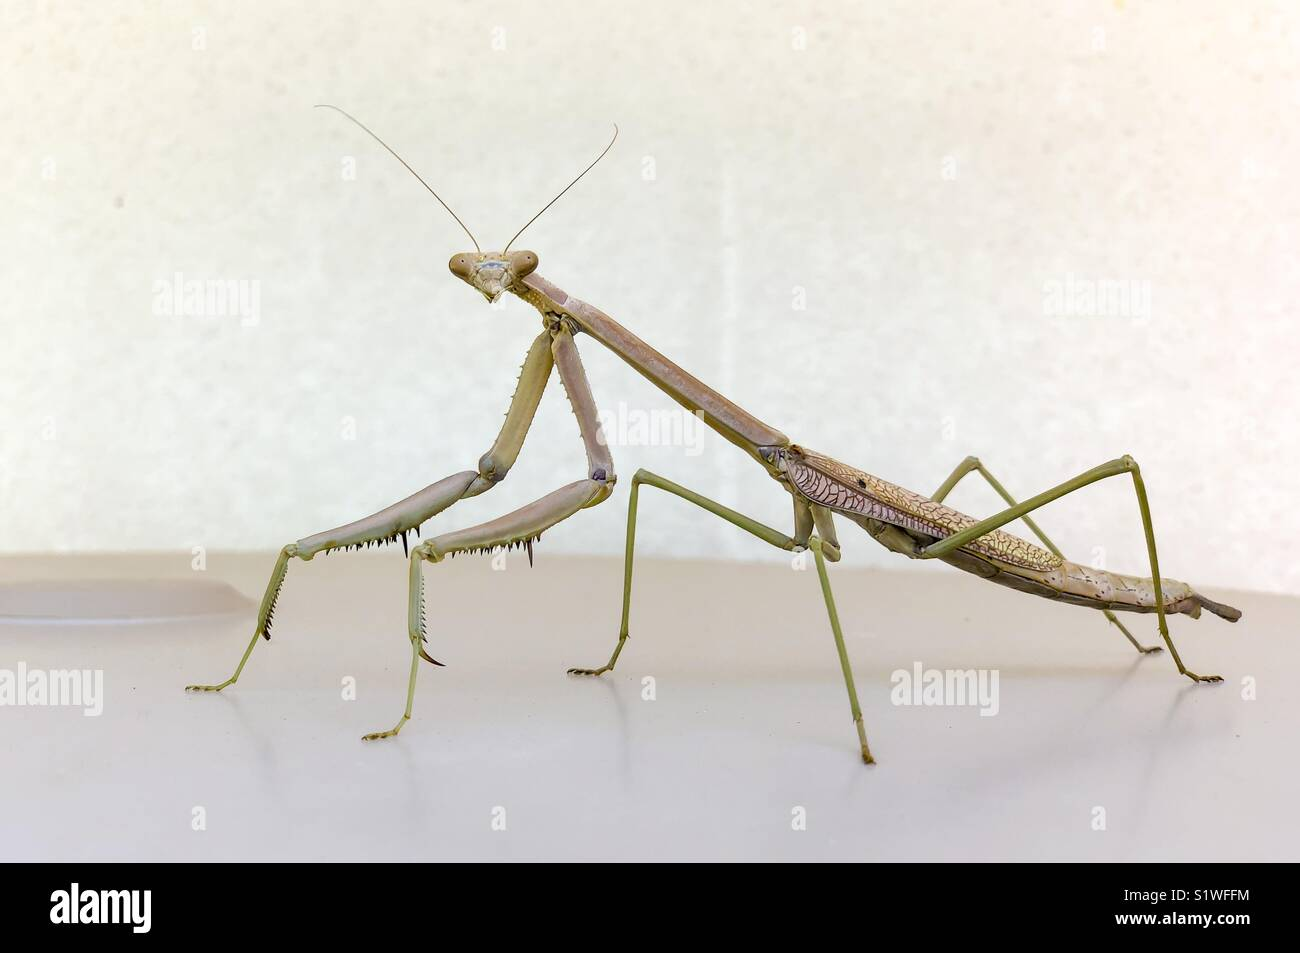 Portrait of a big Praying Mantis. Stock Photo